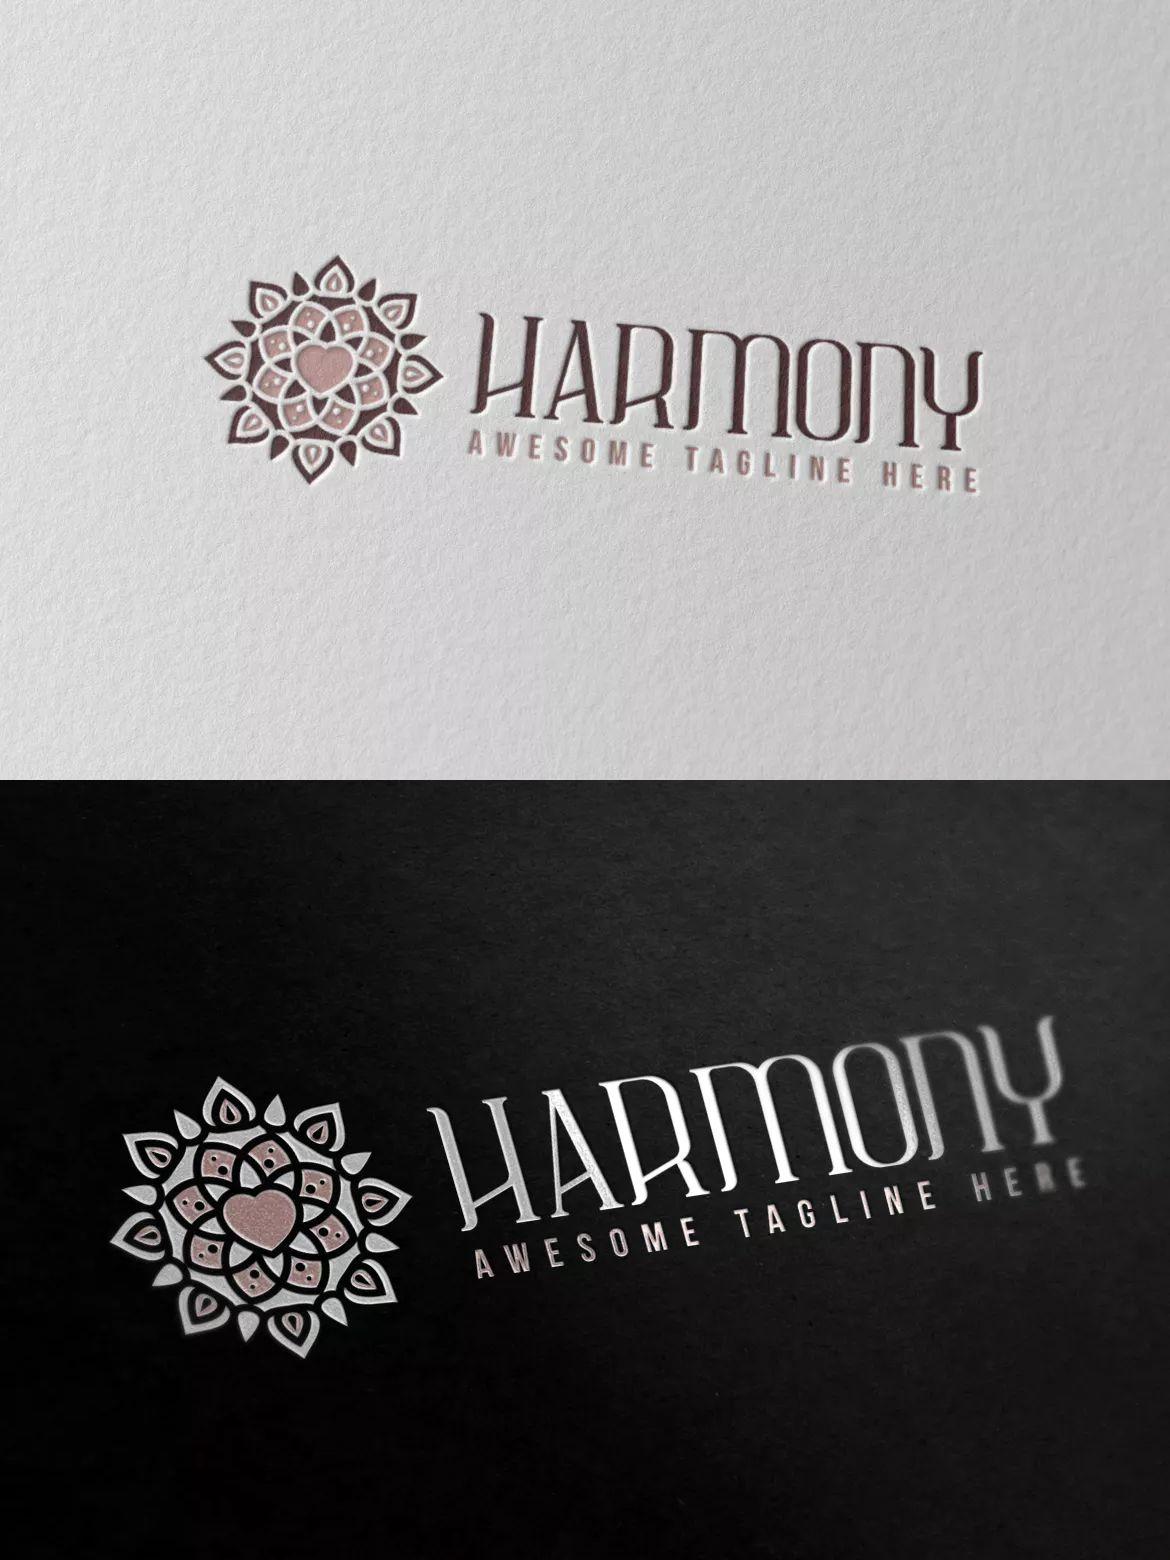 Harmony Logo 2 Template AI, EPS, PSD #unlimiteddownloads.